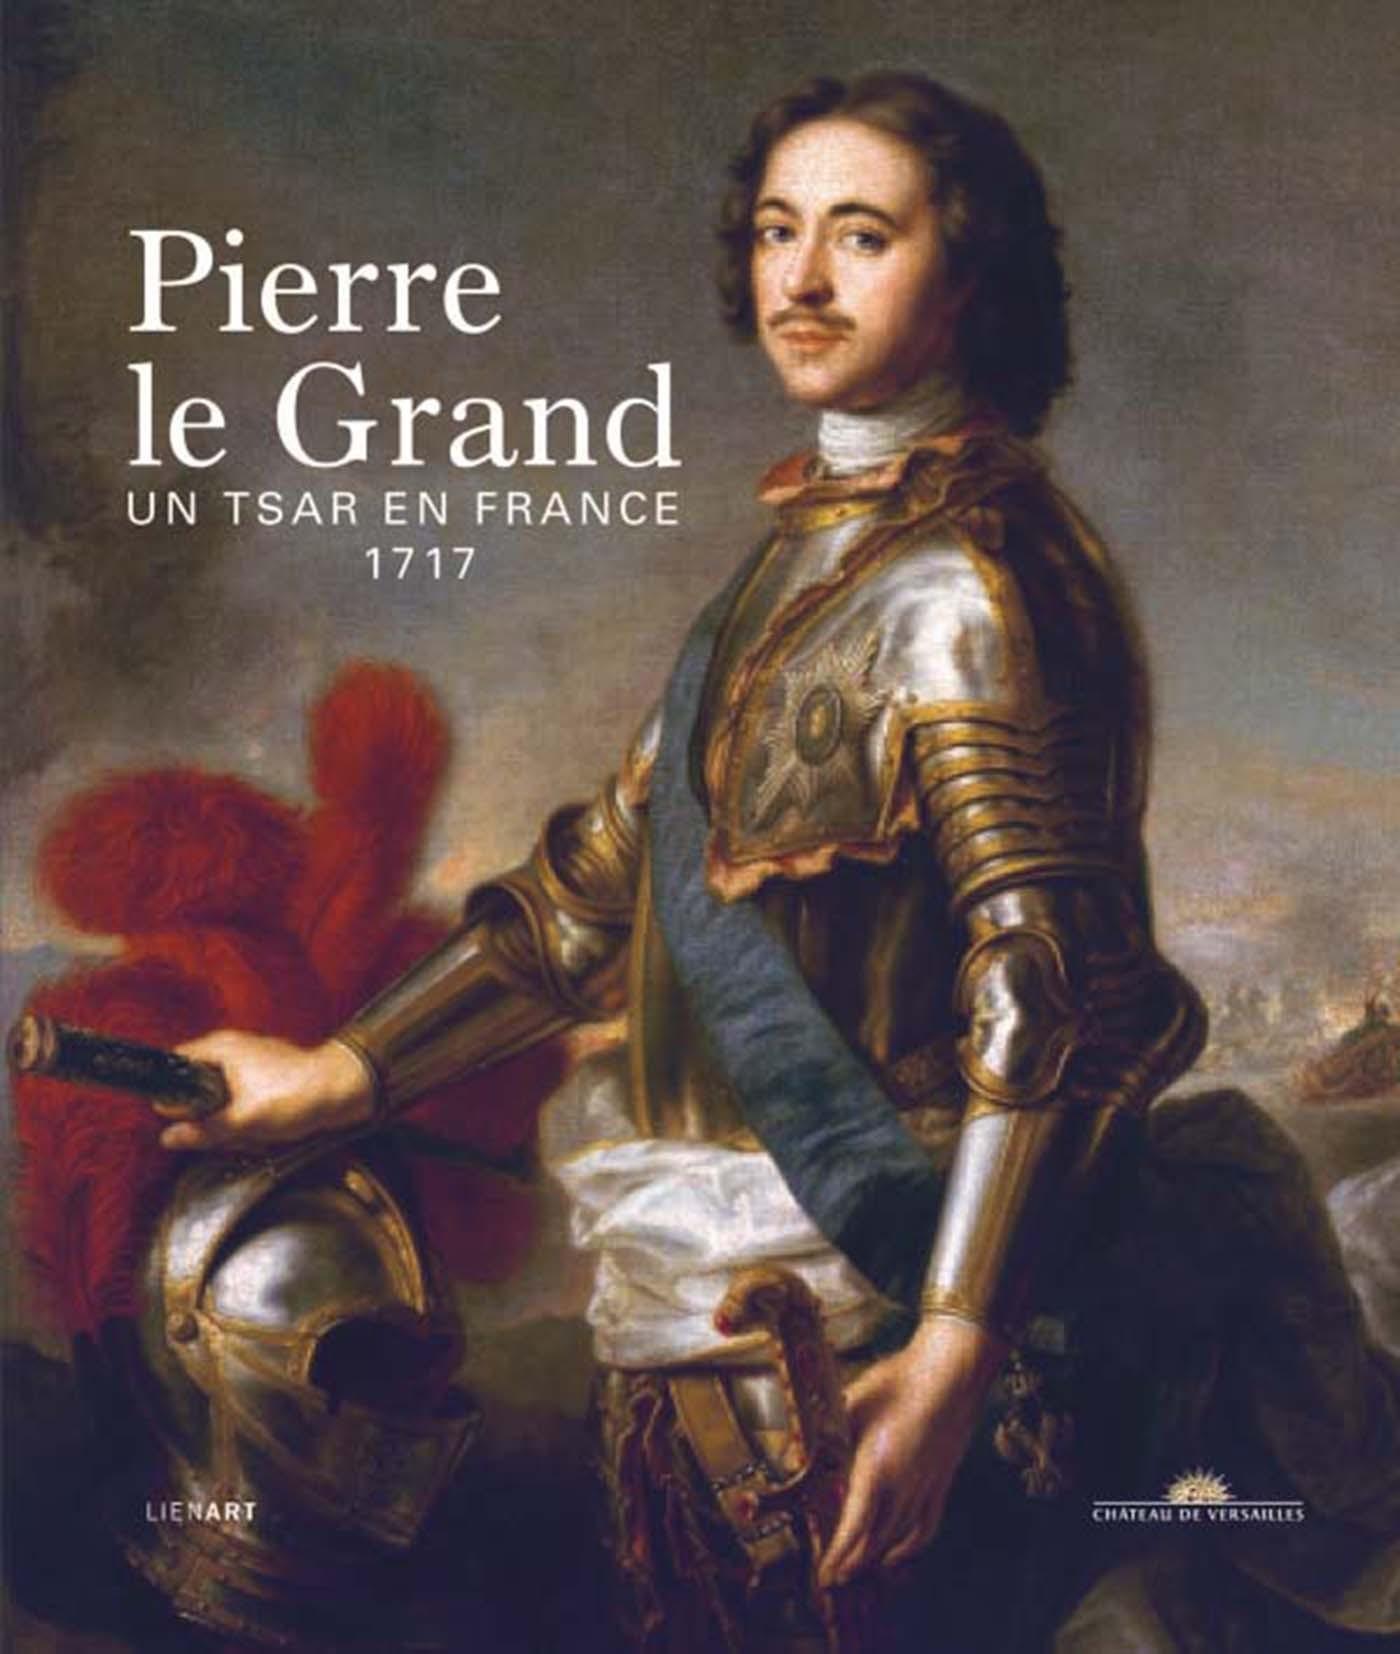 PIERRE LE GRAND, UN TSAR EN FRANCE